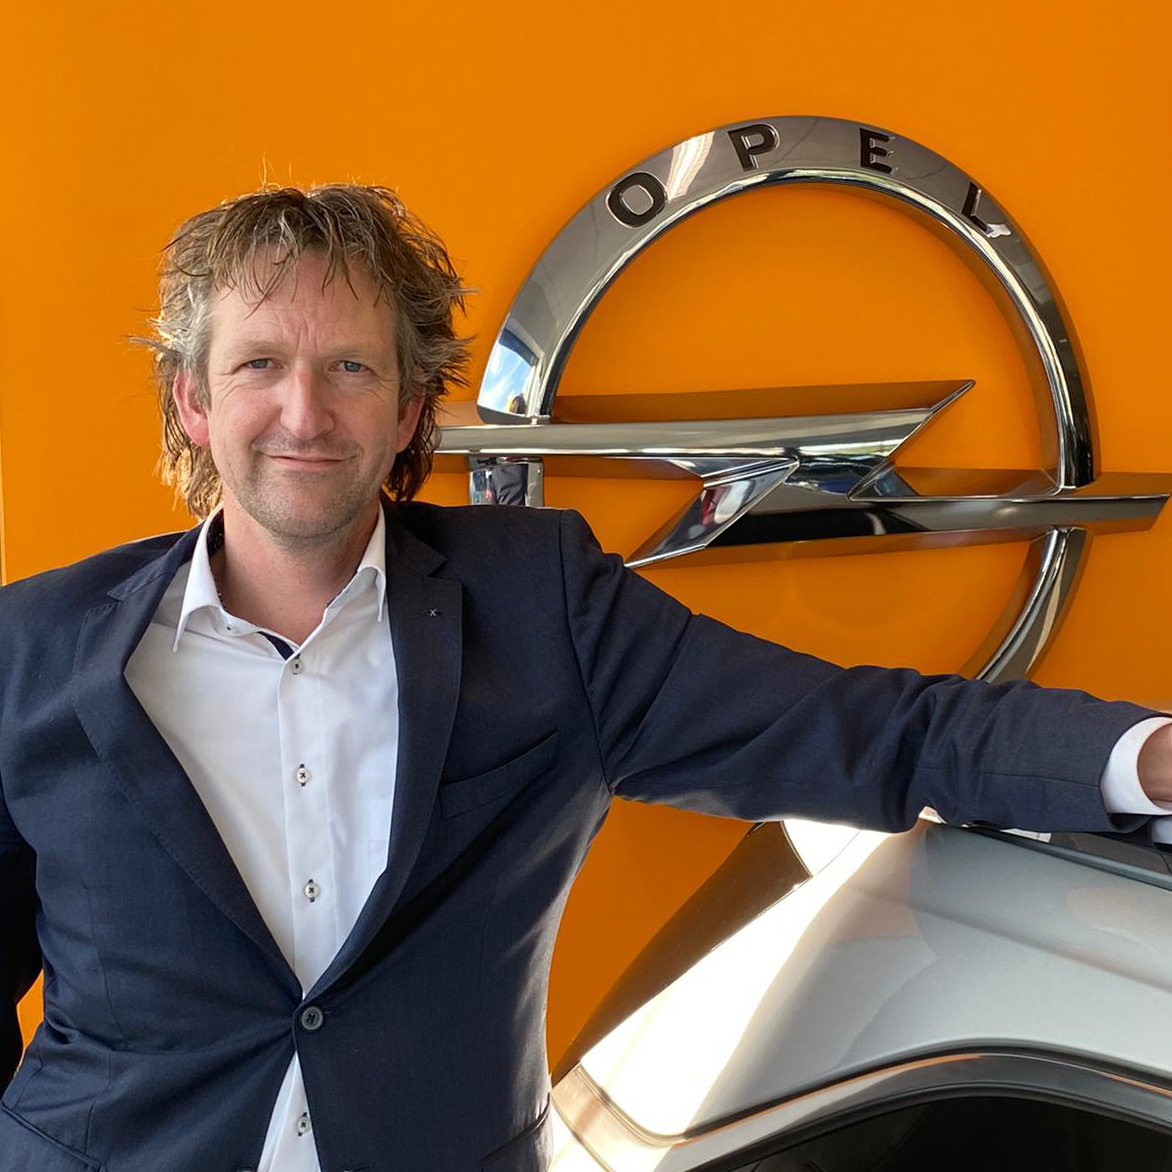 Piet de Vries